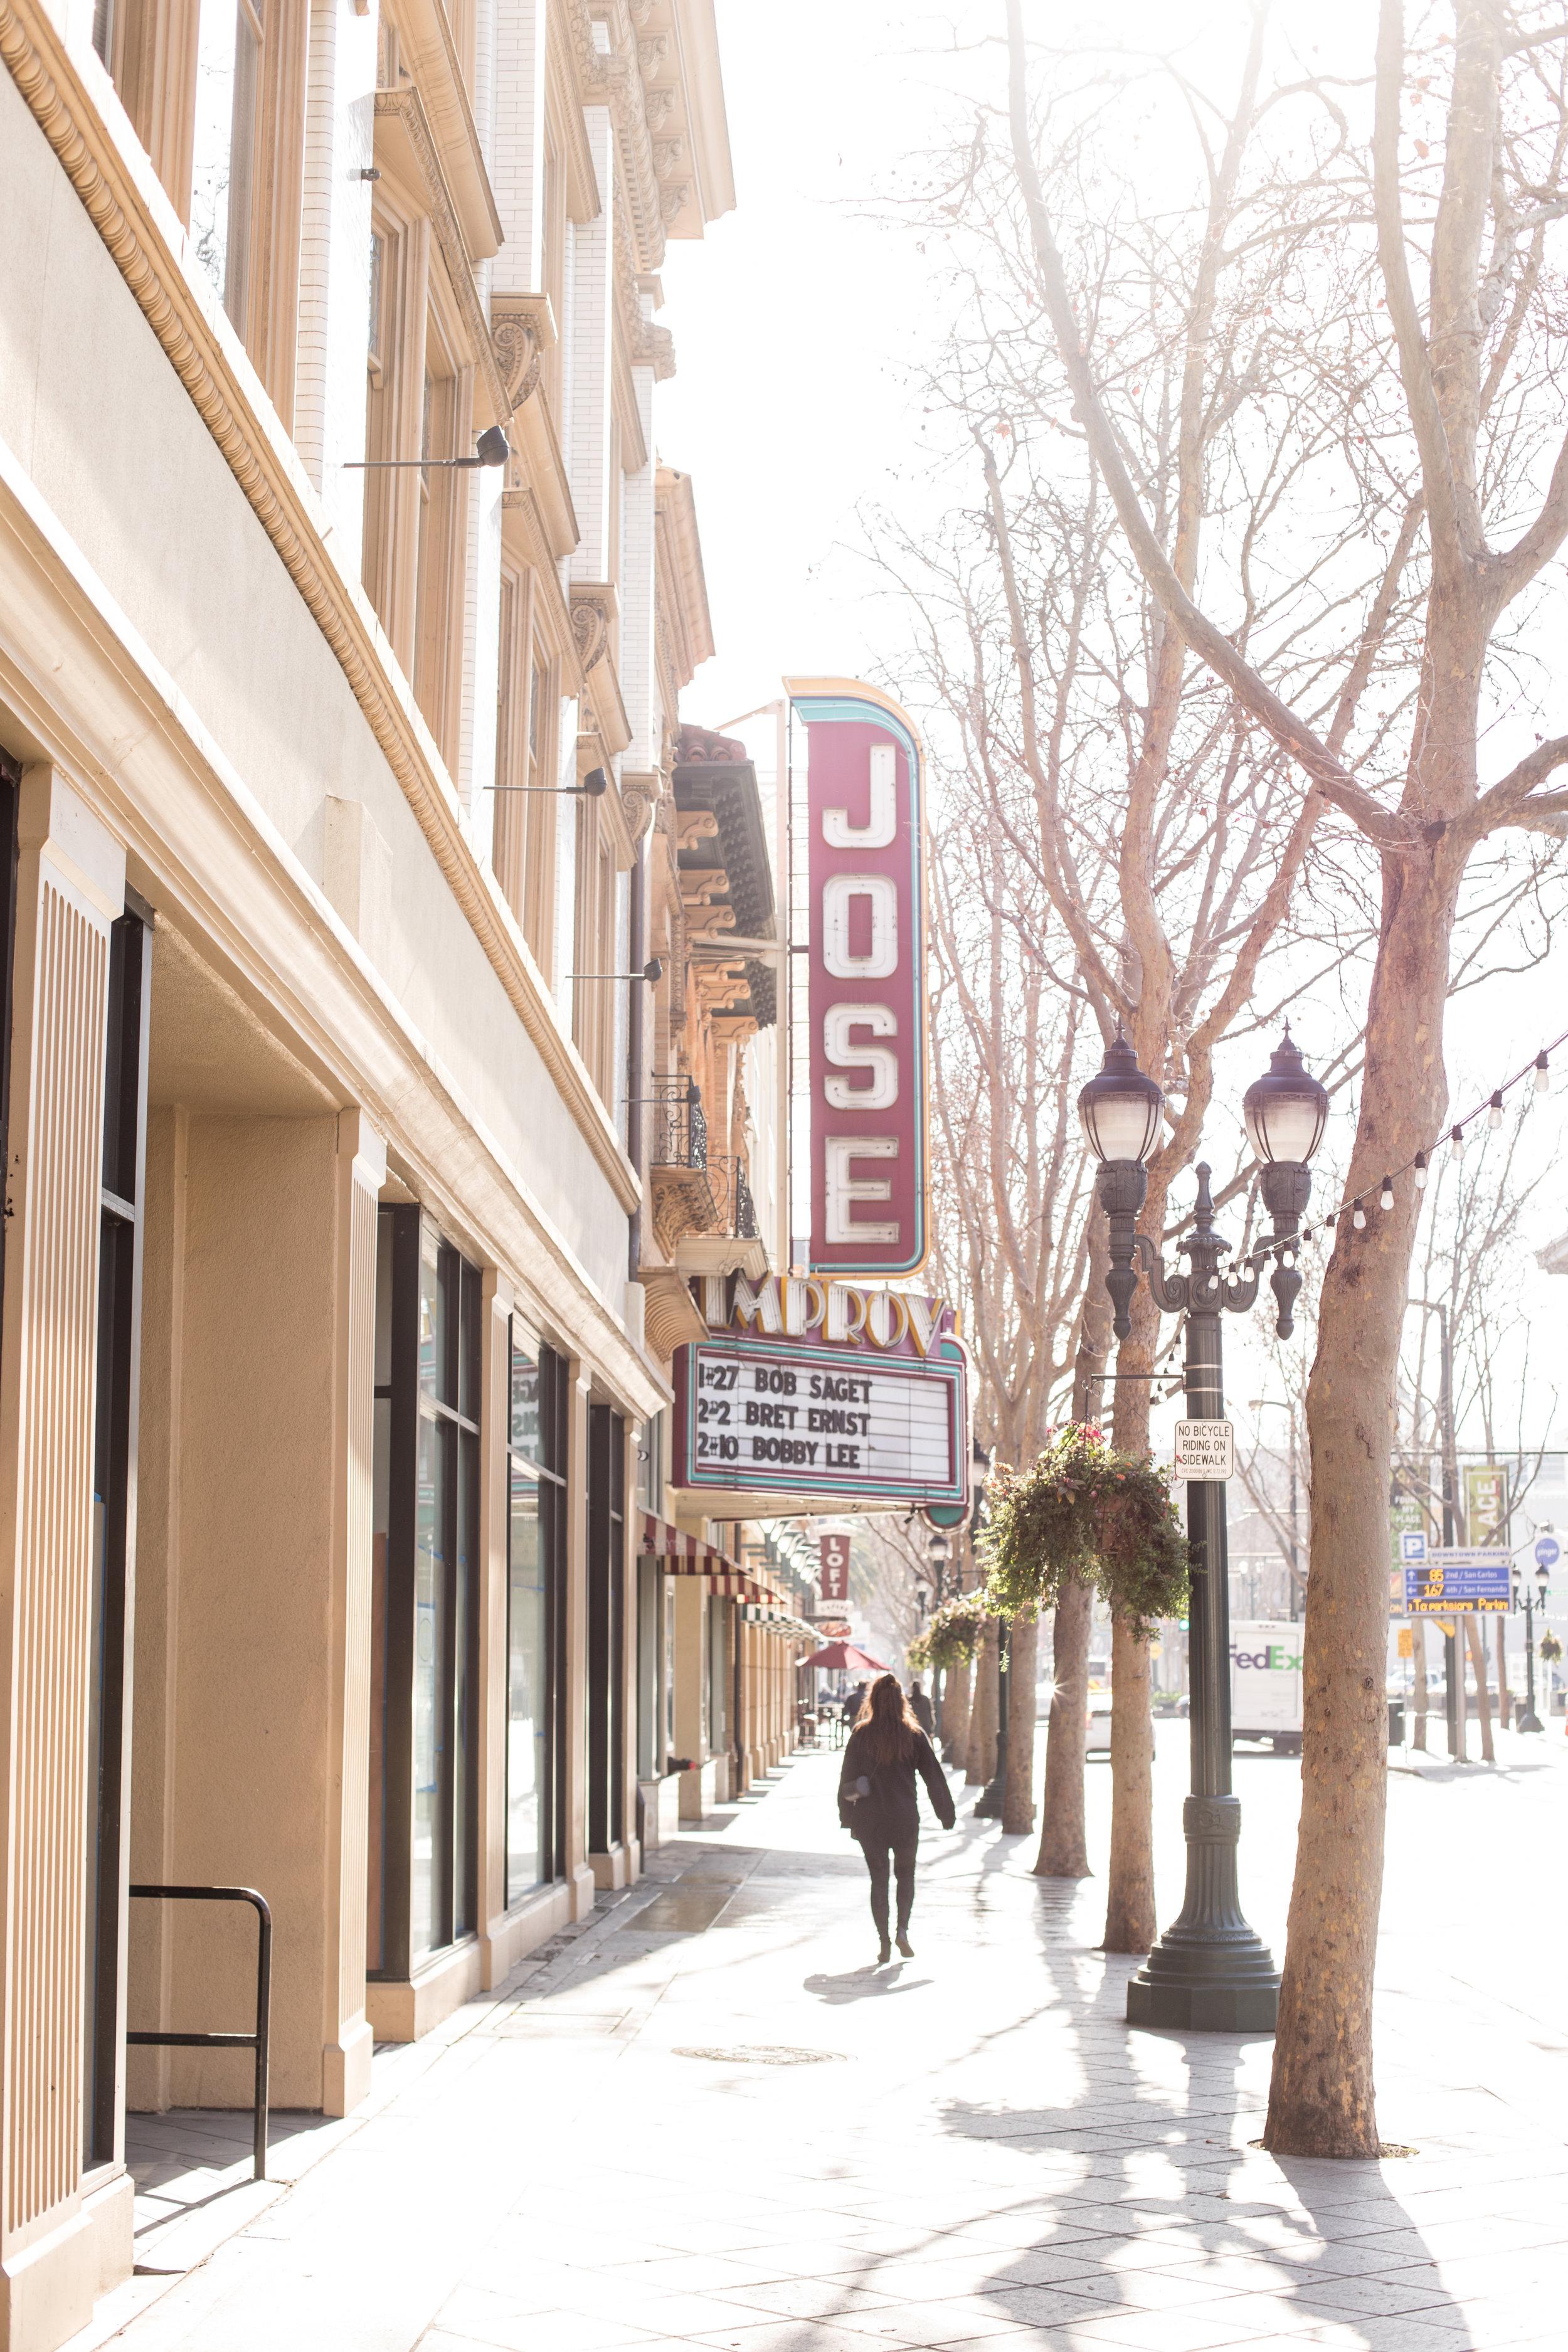 San Jose Improv in downtown